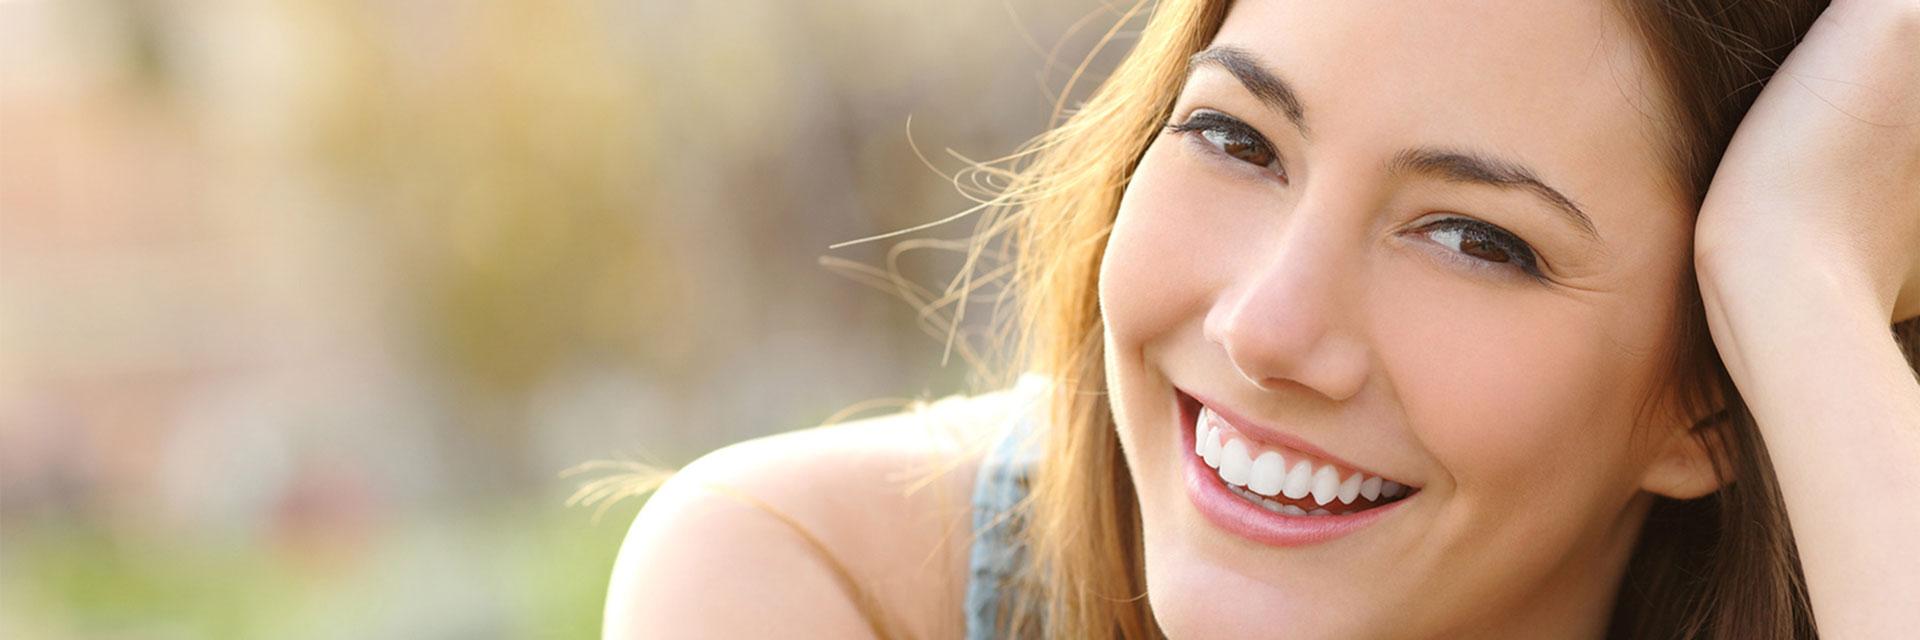 parodontologia salerno